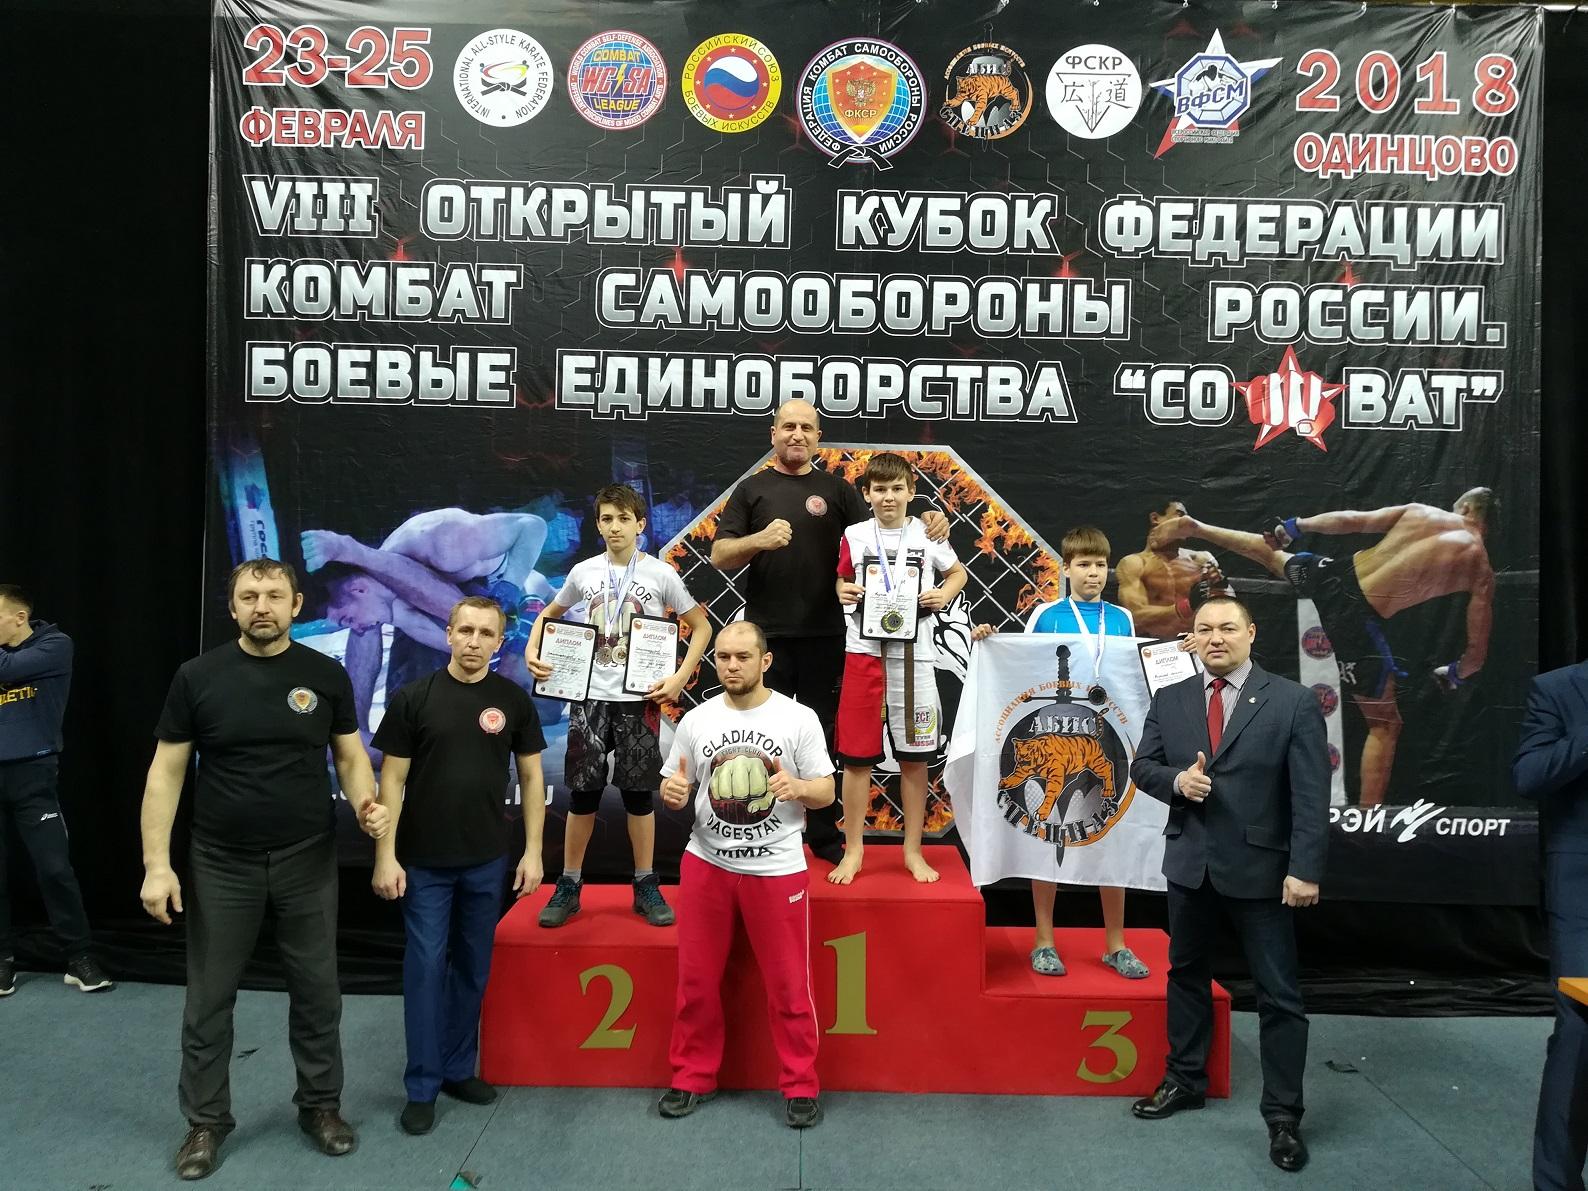 http://combatsd.ru/images/upload/IMG_20180225_170626.jpg